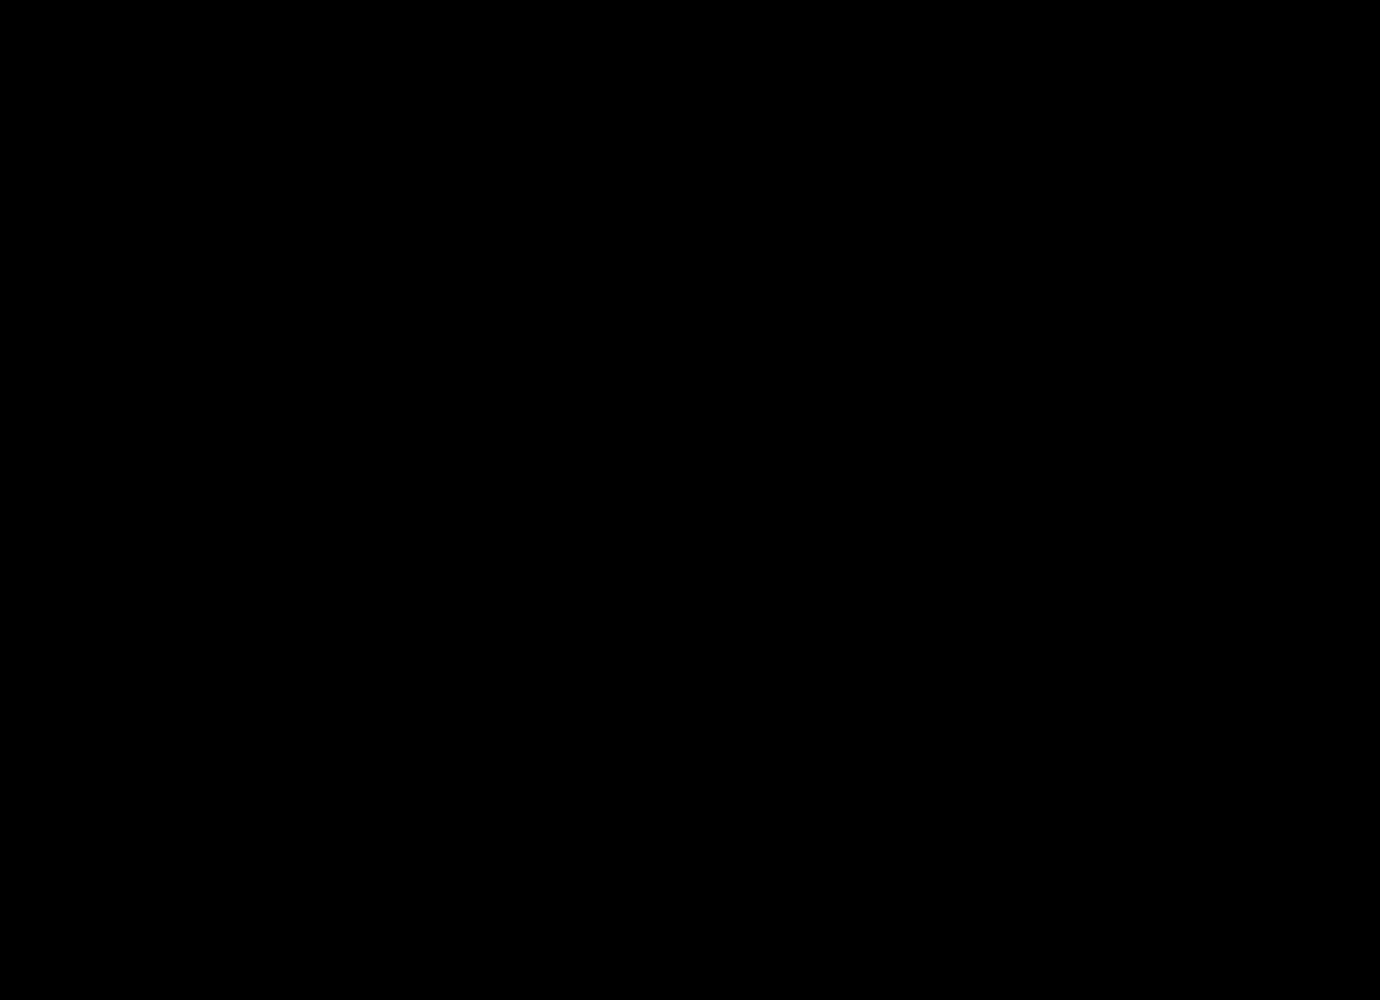 planètes emoji soleil